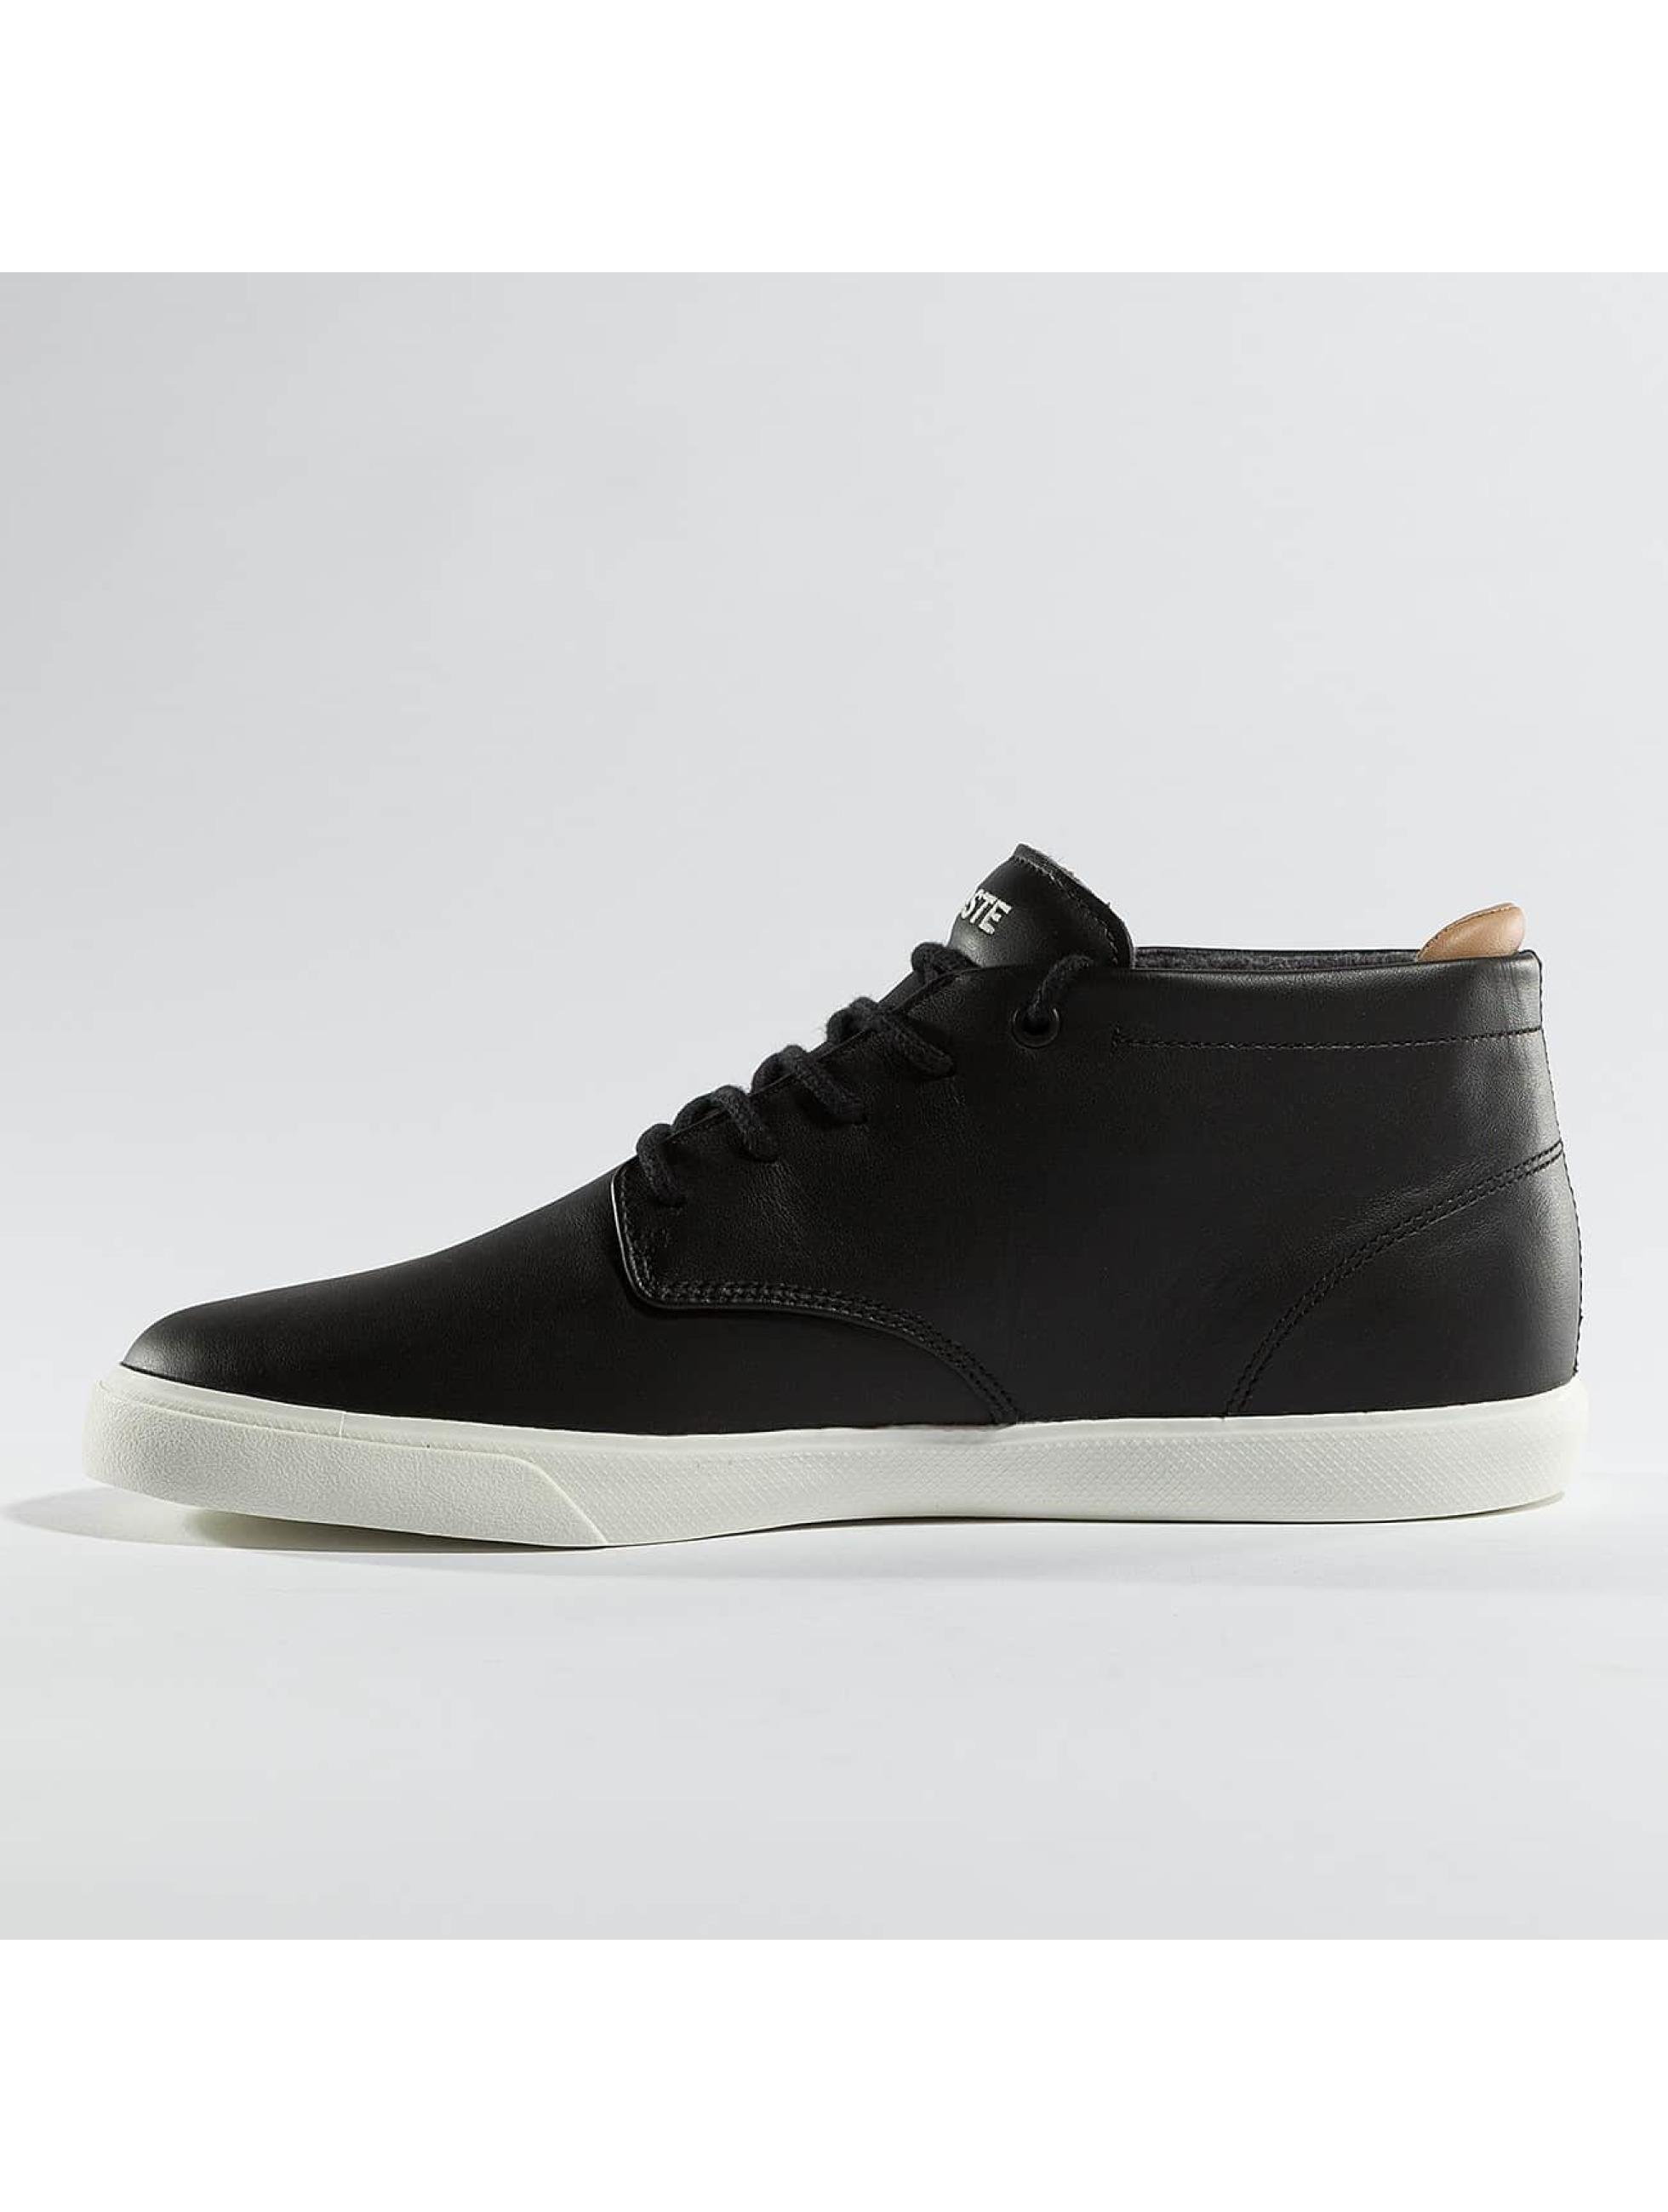 Lacoste Sneakers Espere Chukka 417 1 QSP Cam black